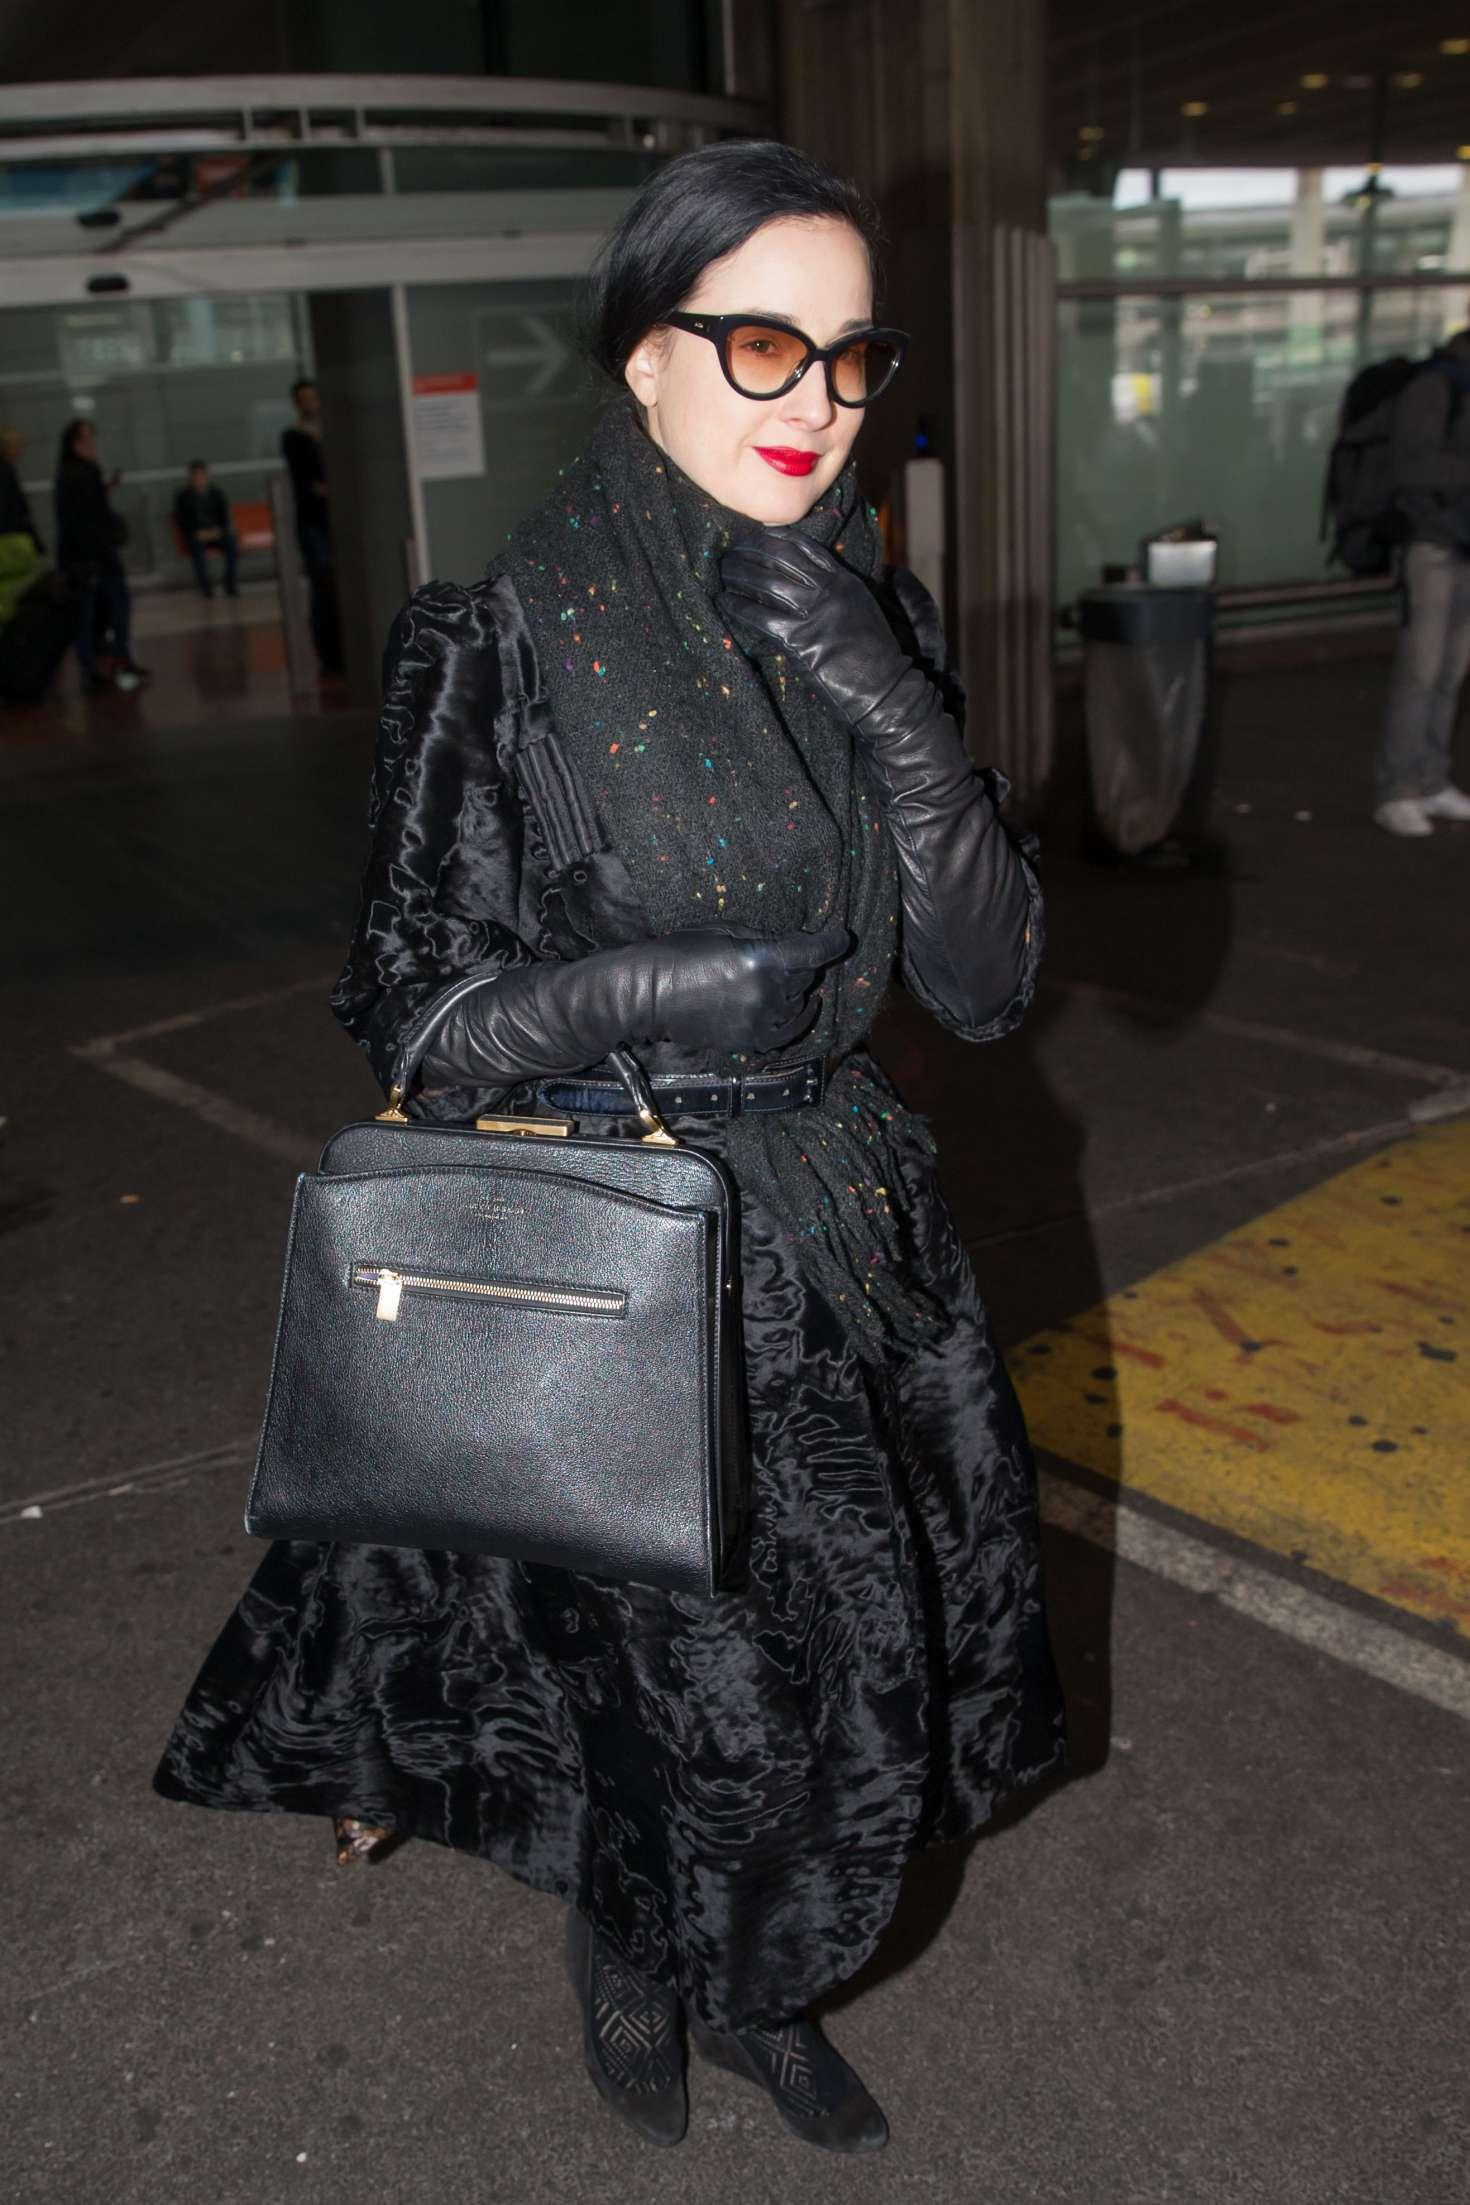 Dita Von Teese arrives at Charles de Gaulle Airport in Paris